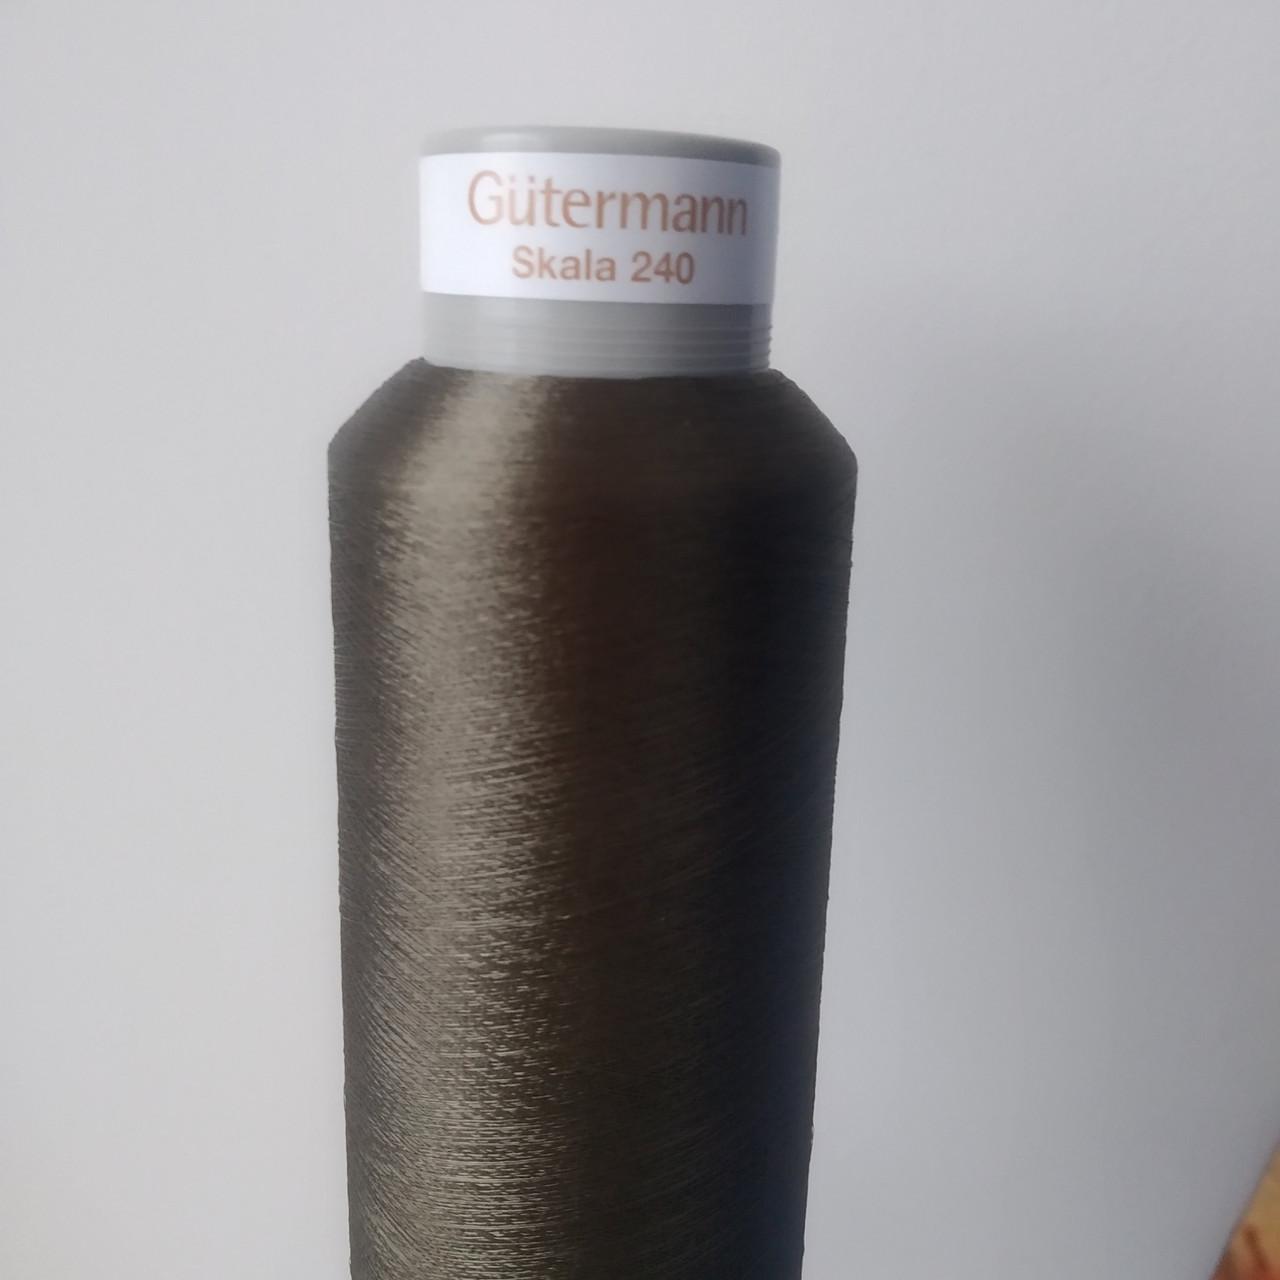 Gutermann skala 240 / 5000м